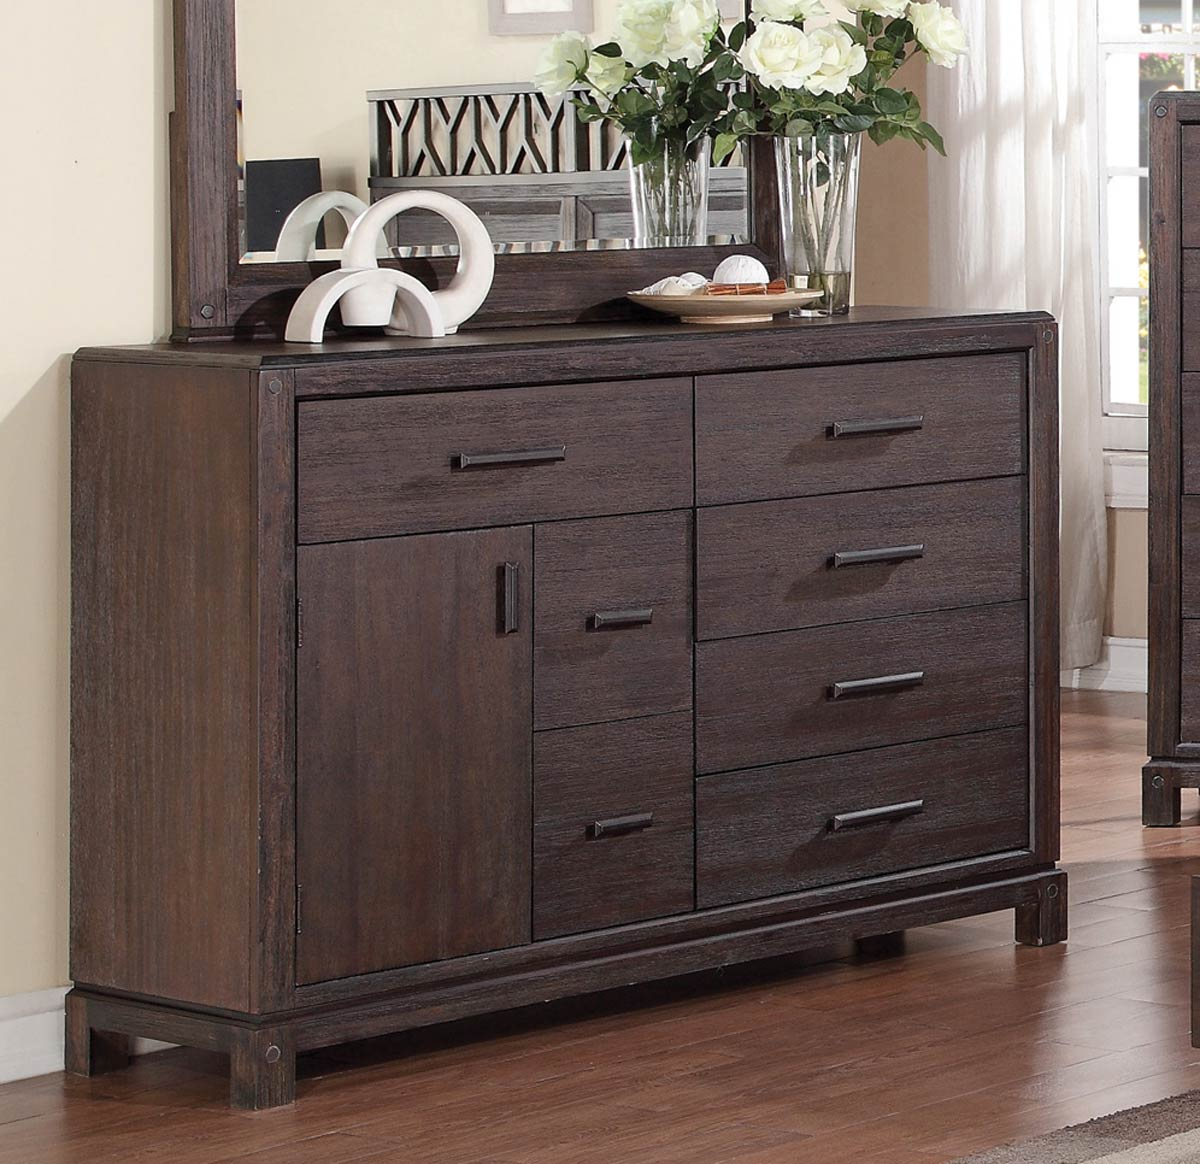 Coaster Grayson Dresser - Dark Coffee